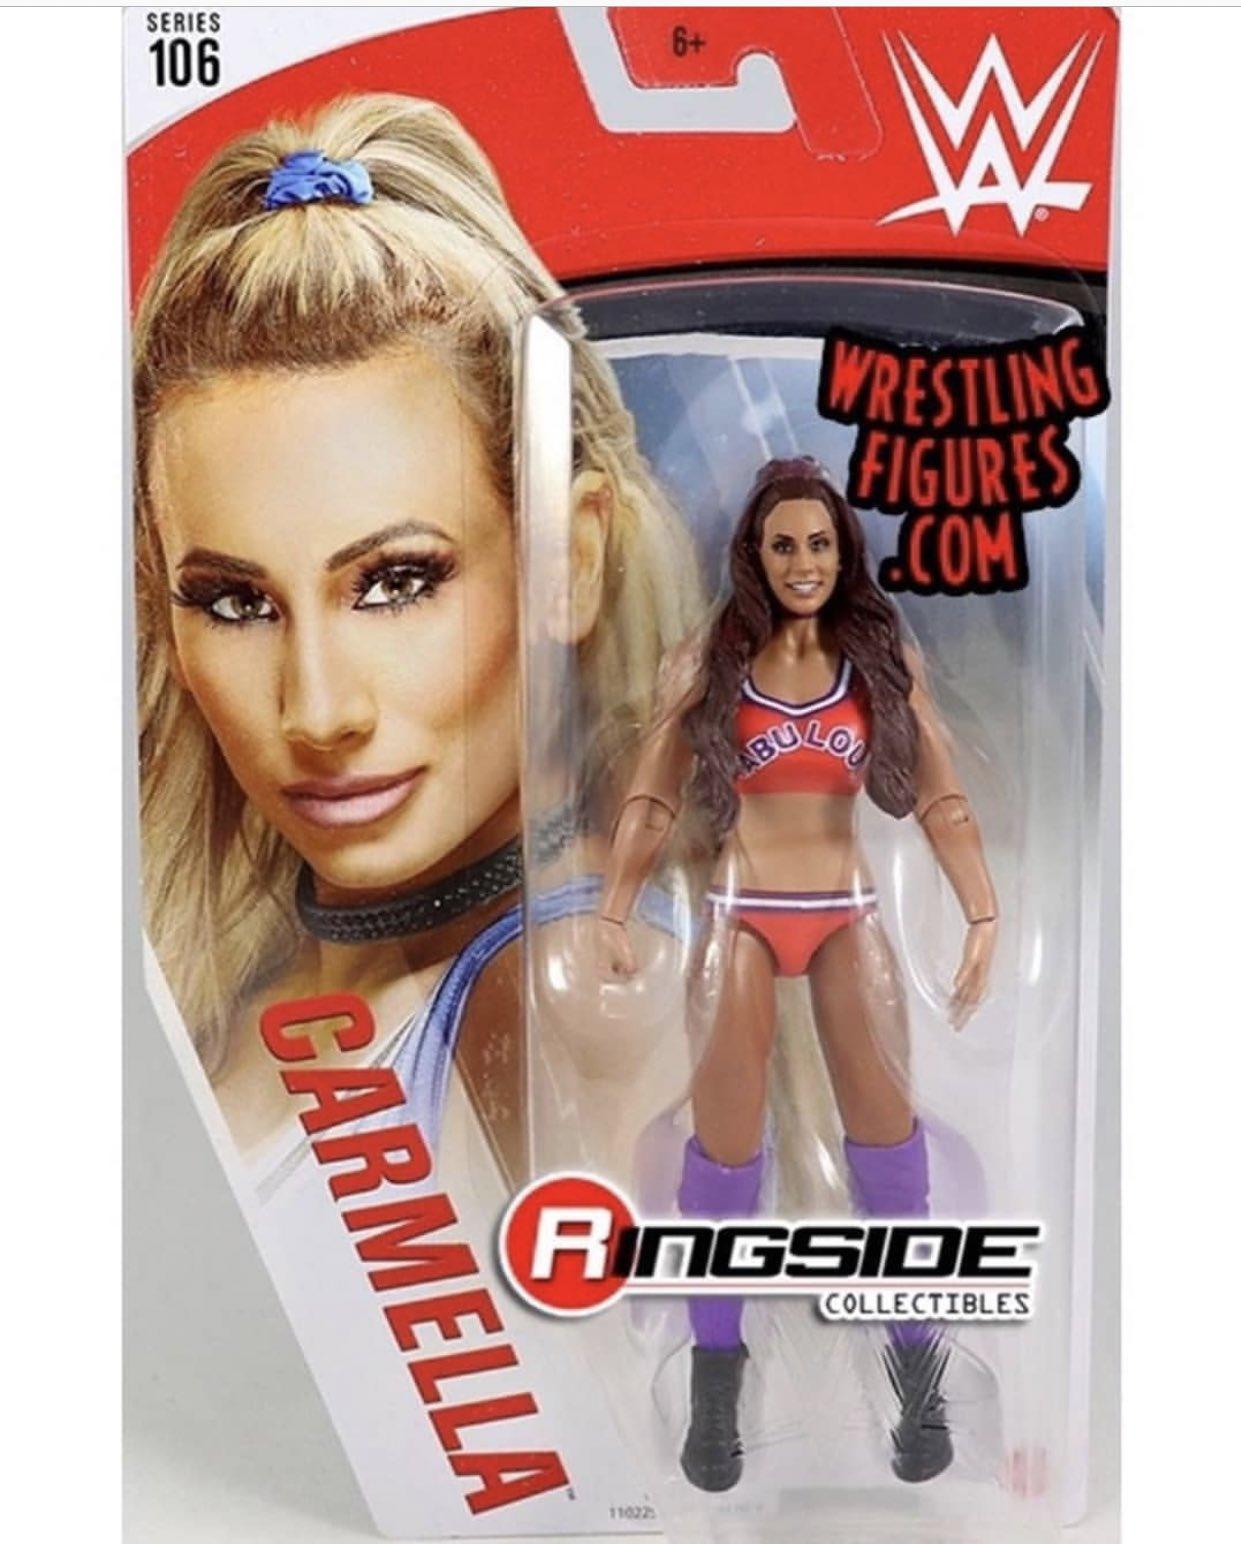 Mattel WWE Basic Series 106 Carmella Regular and Variant Action Figure